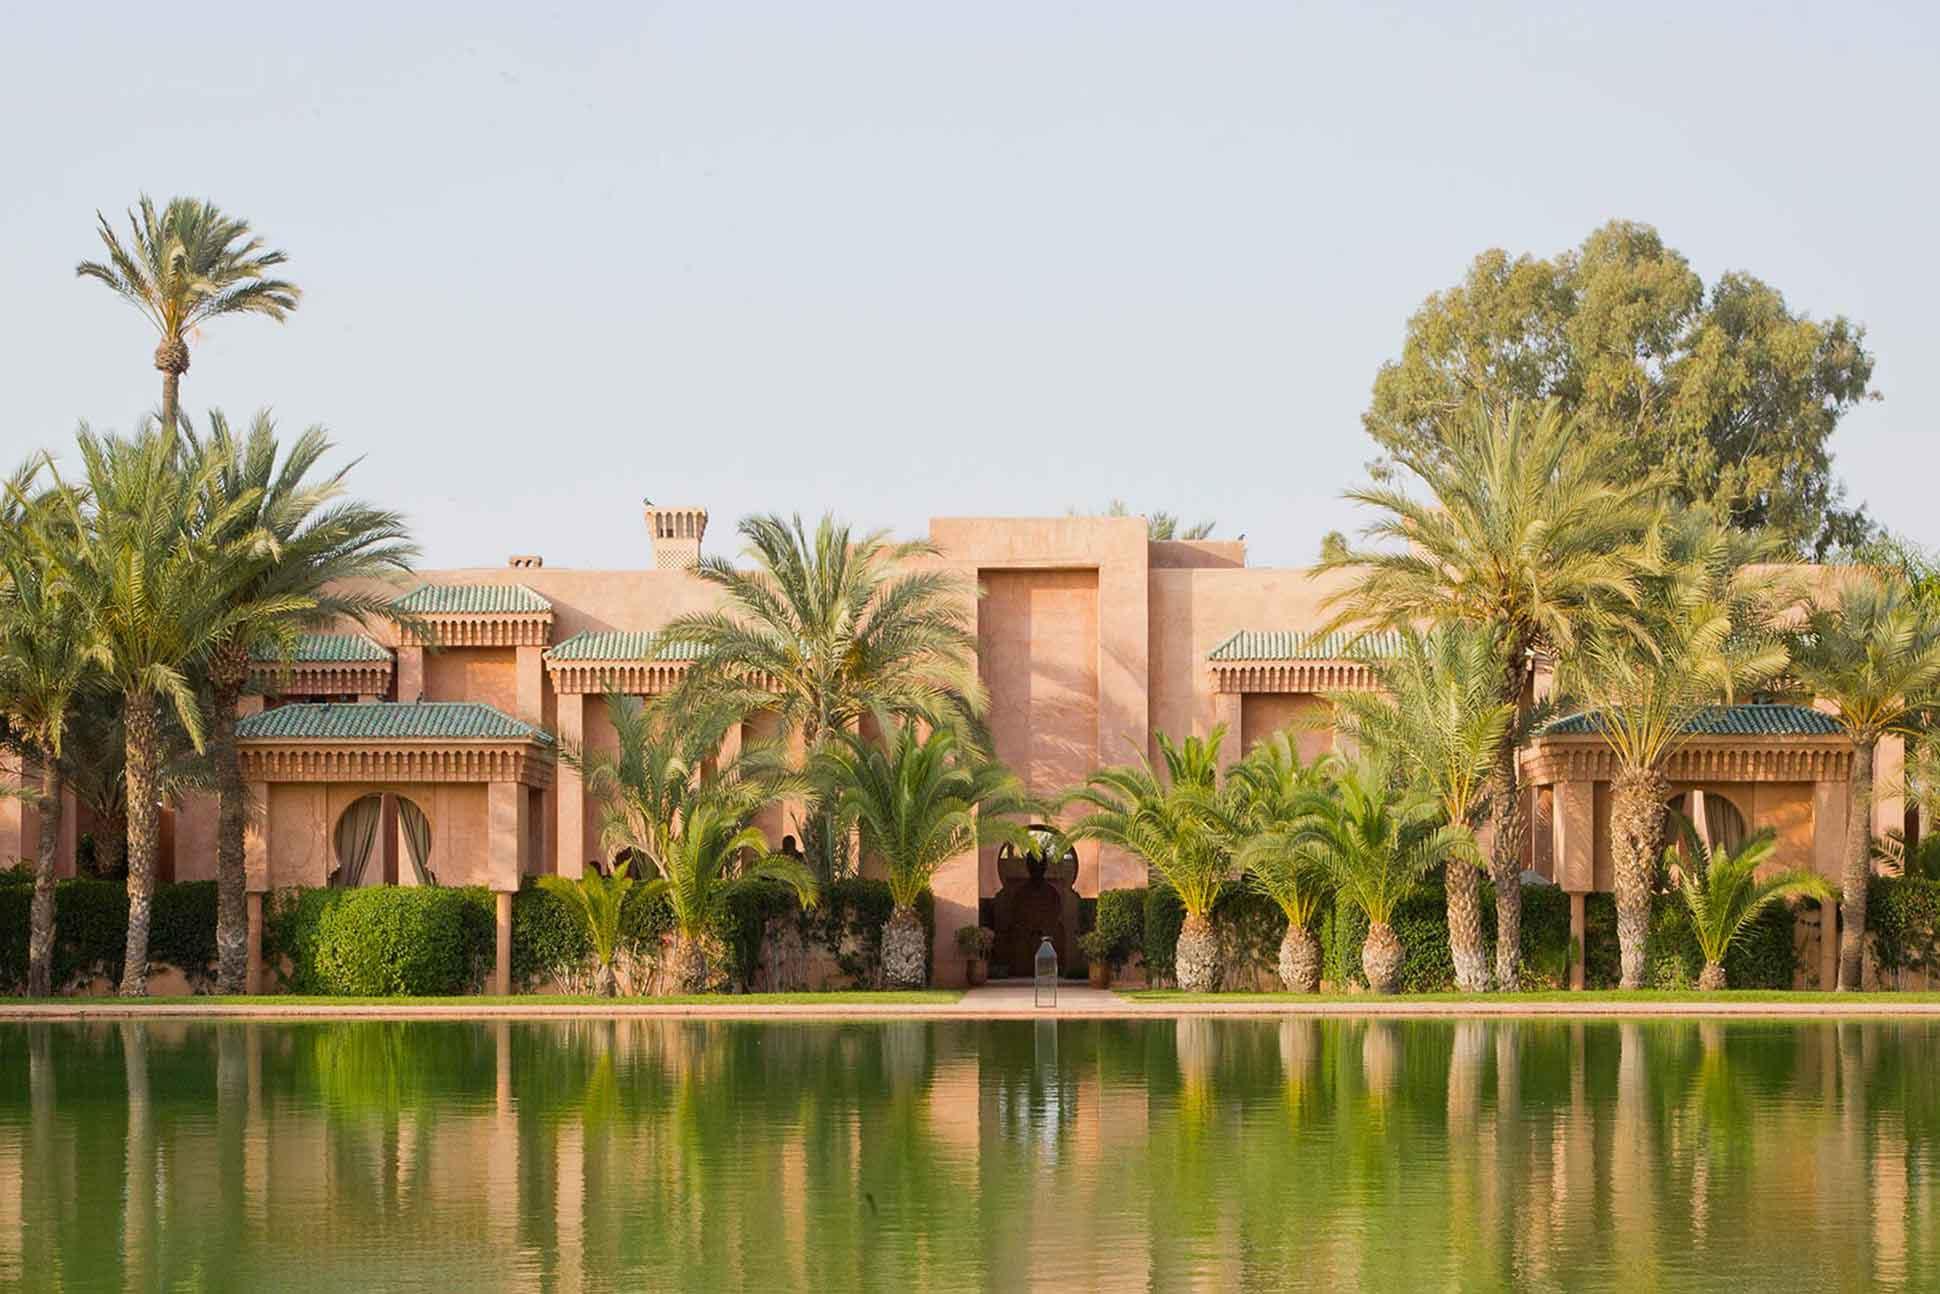 Exterior of Amanjena by Aman Resorts, Marrakech